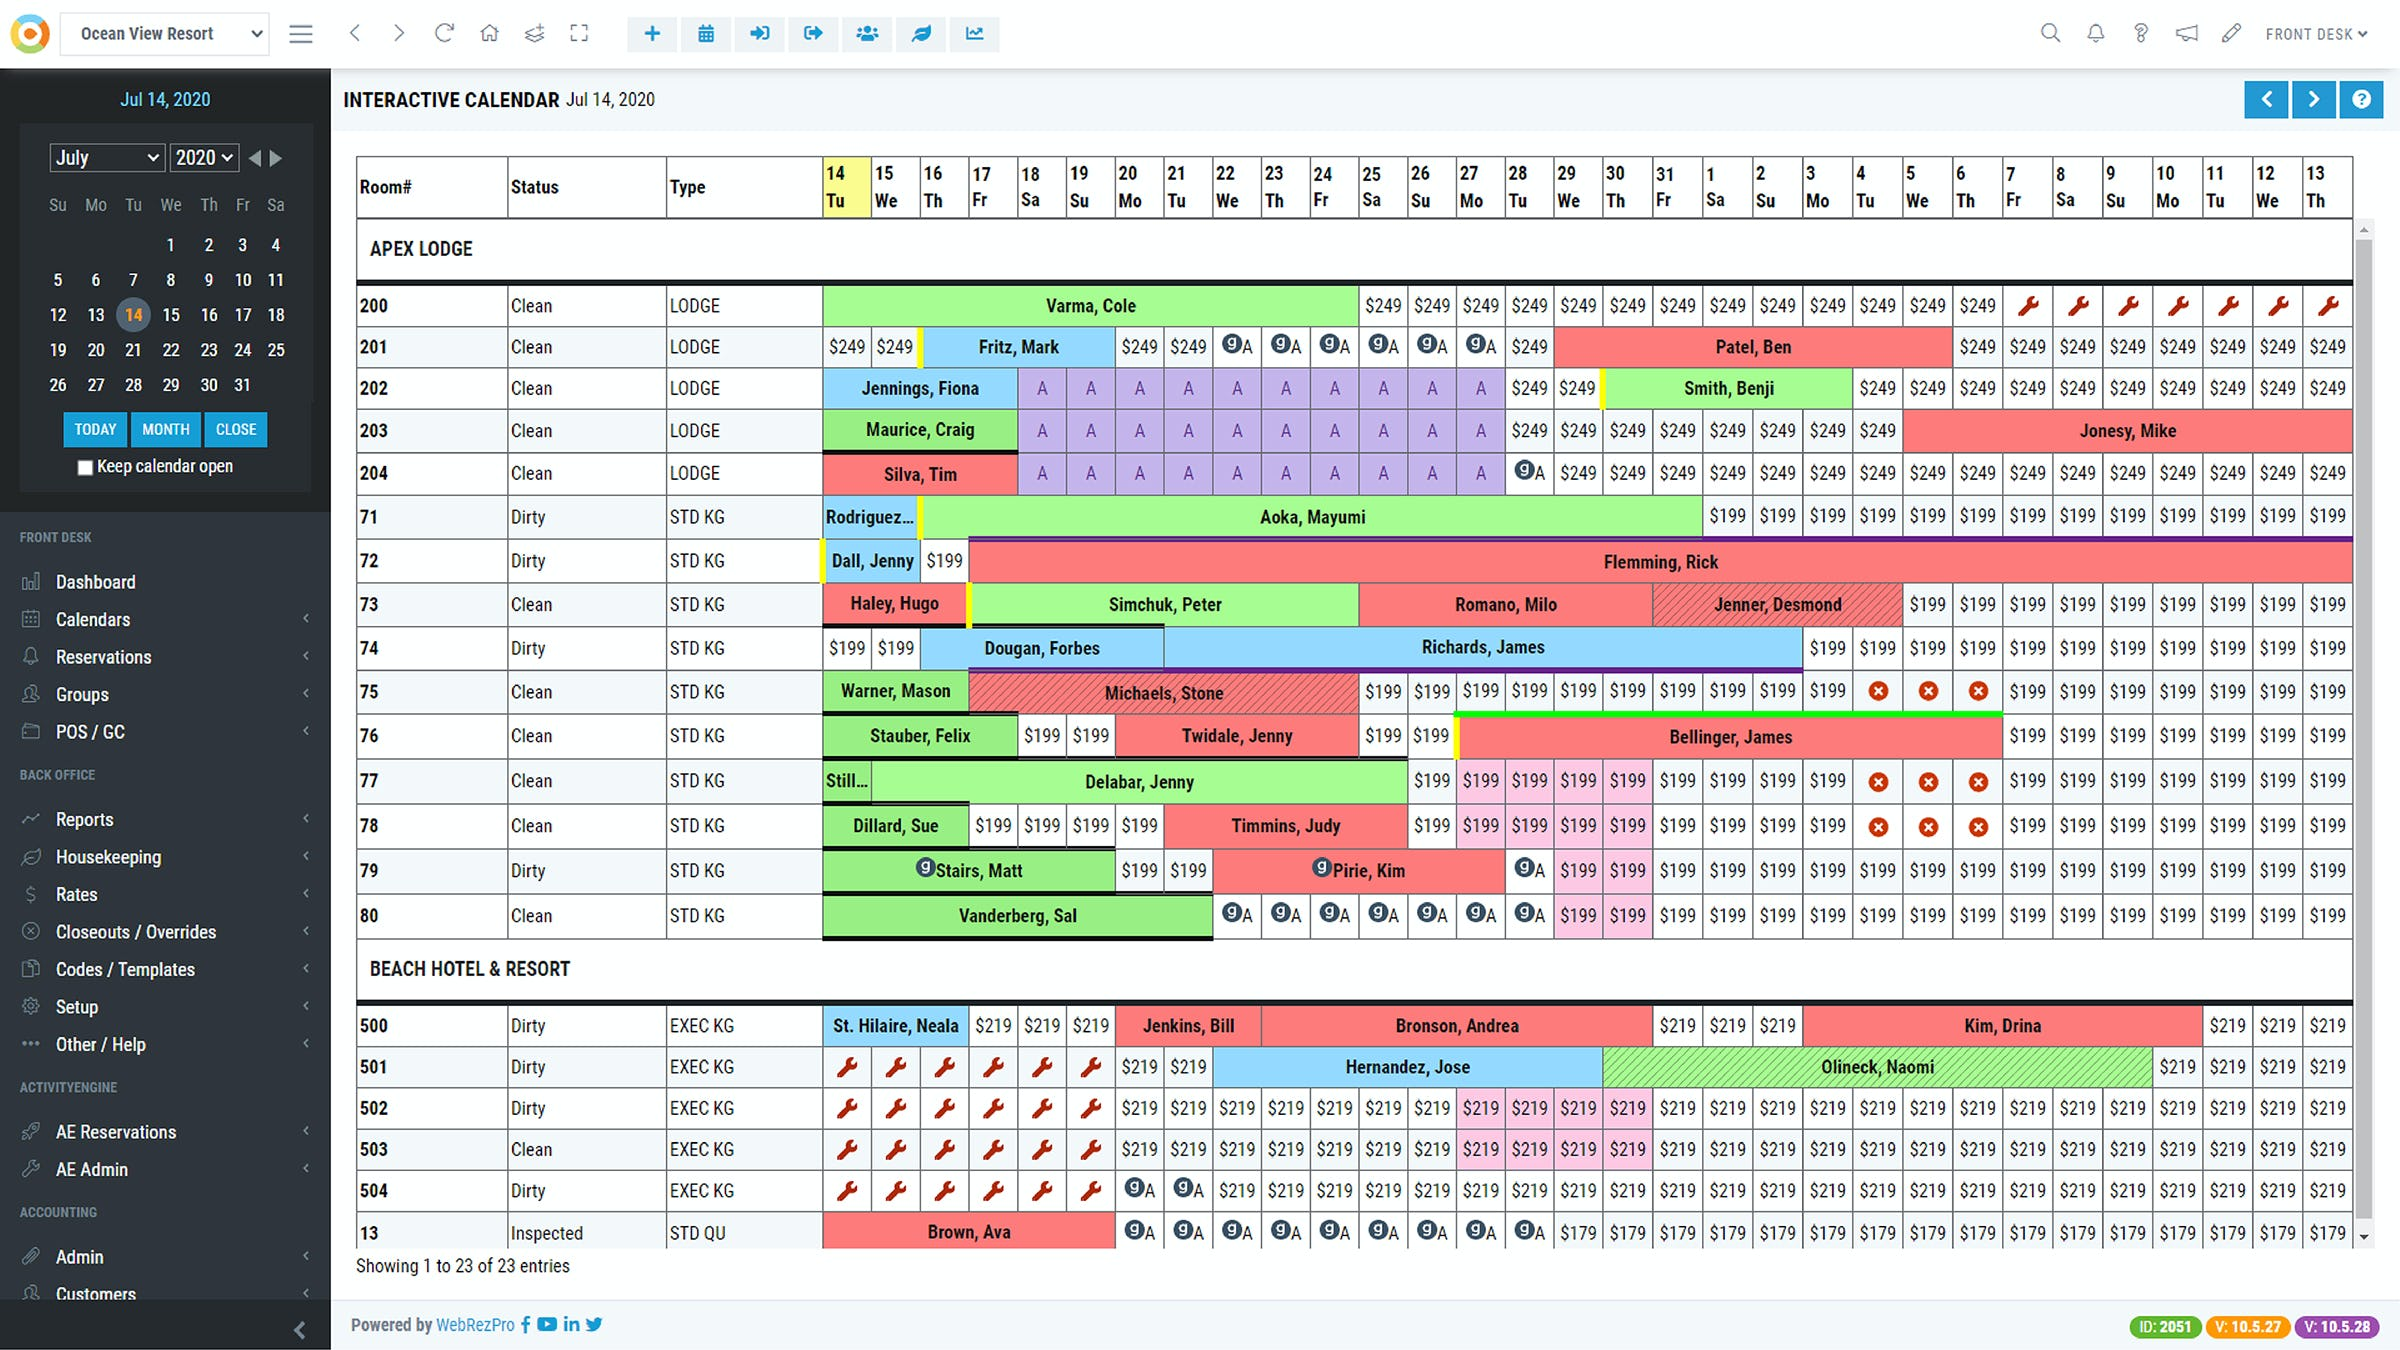 WebRezPro Software - 1